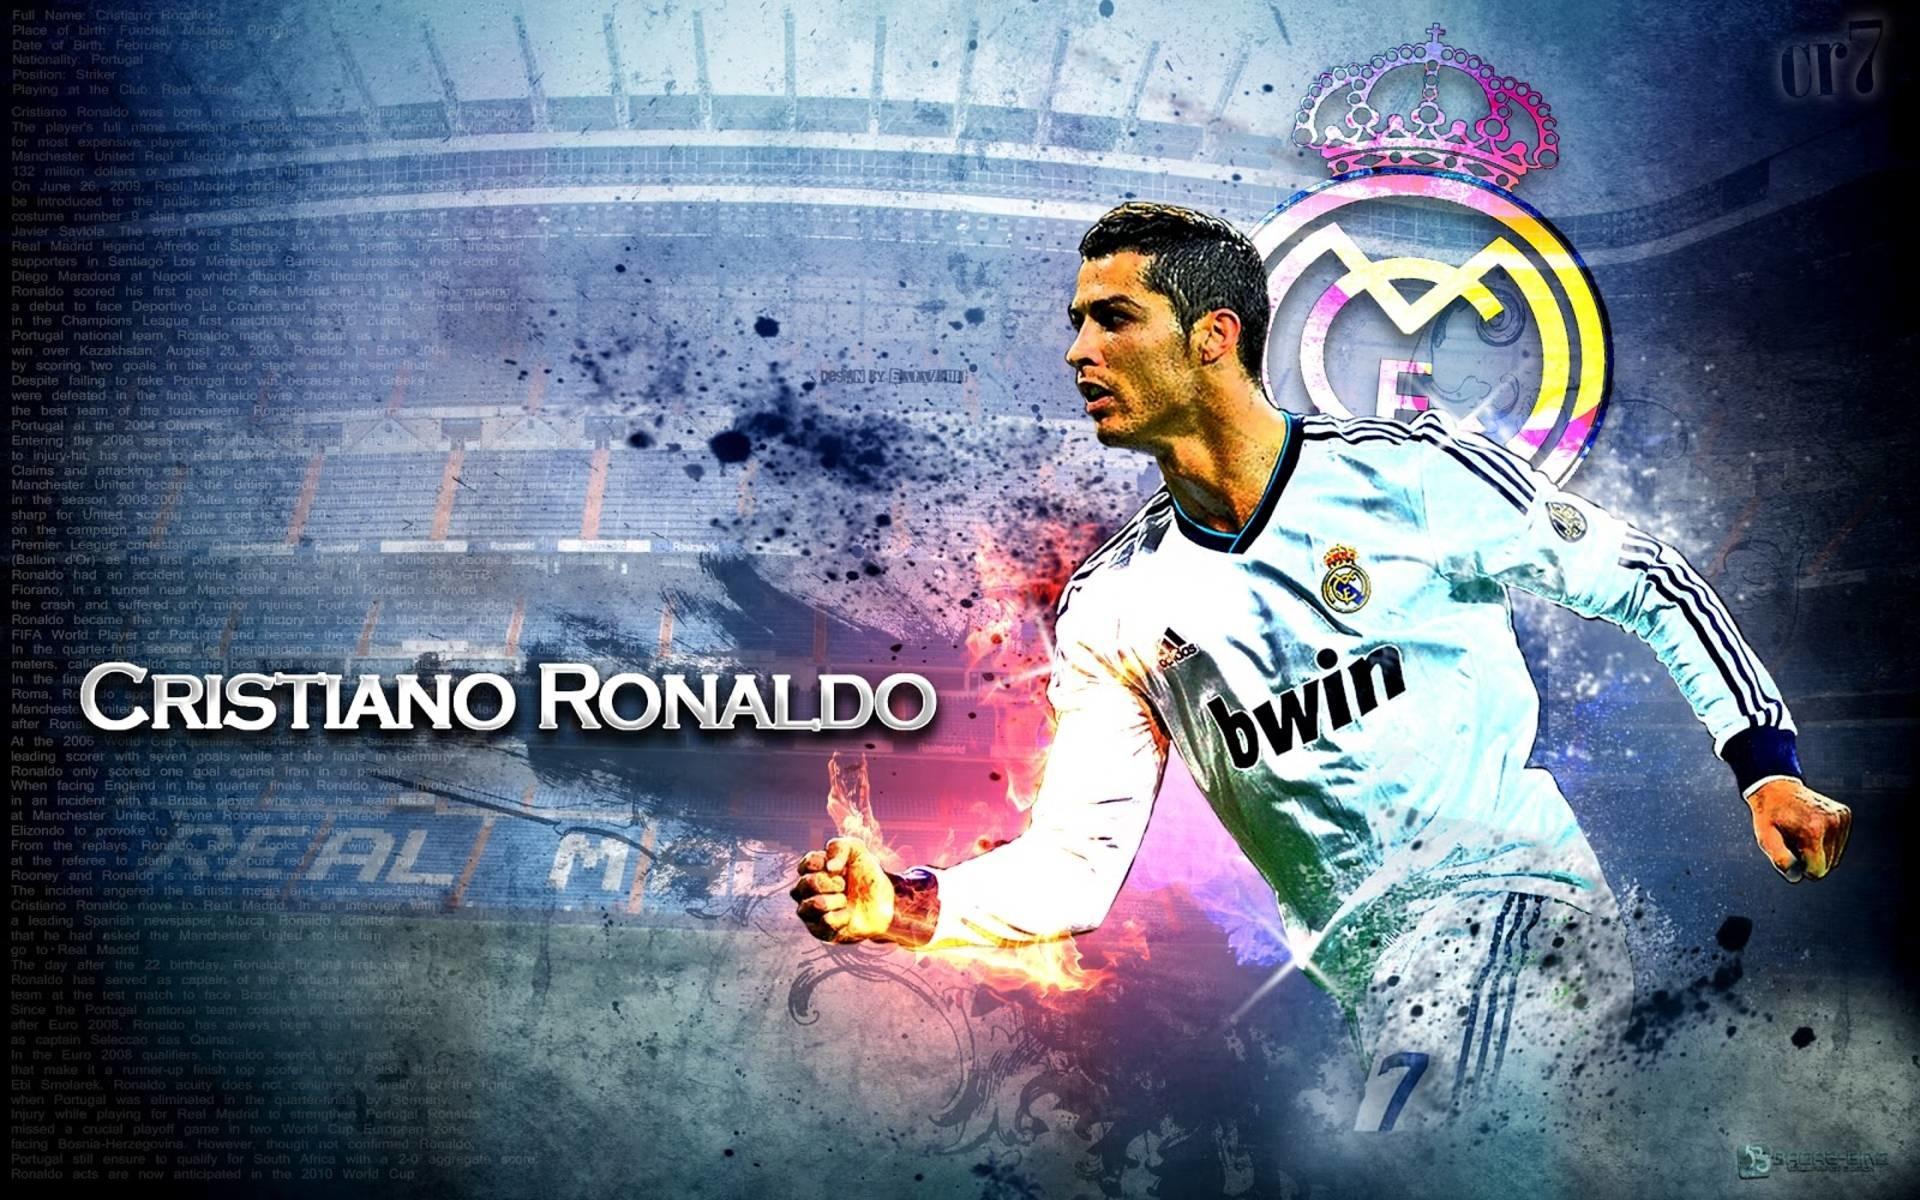 Cristiano Ronaldo HD White Jersey Wallpaper #3407 | Foolhardi.